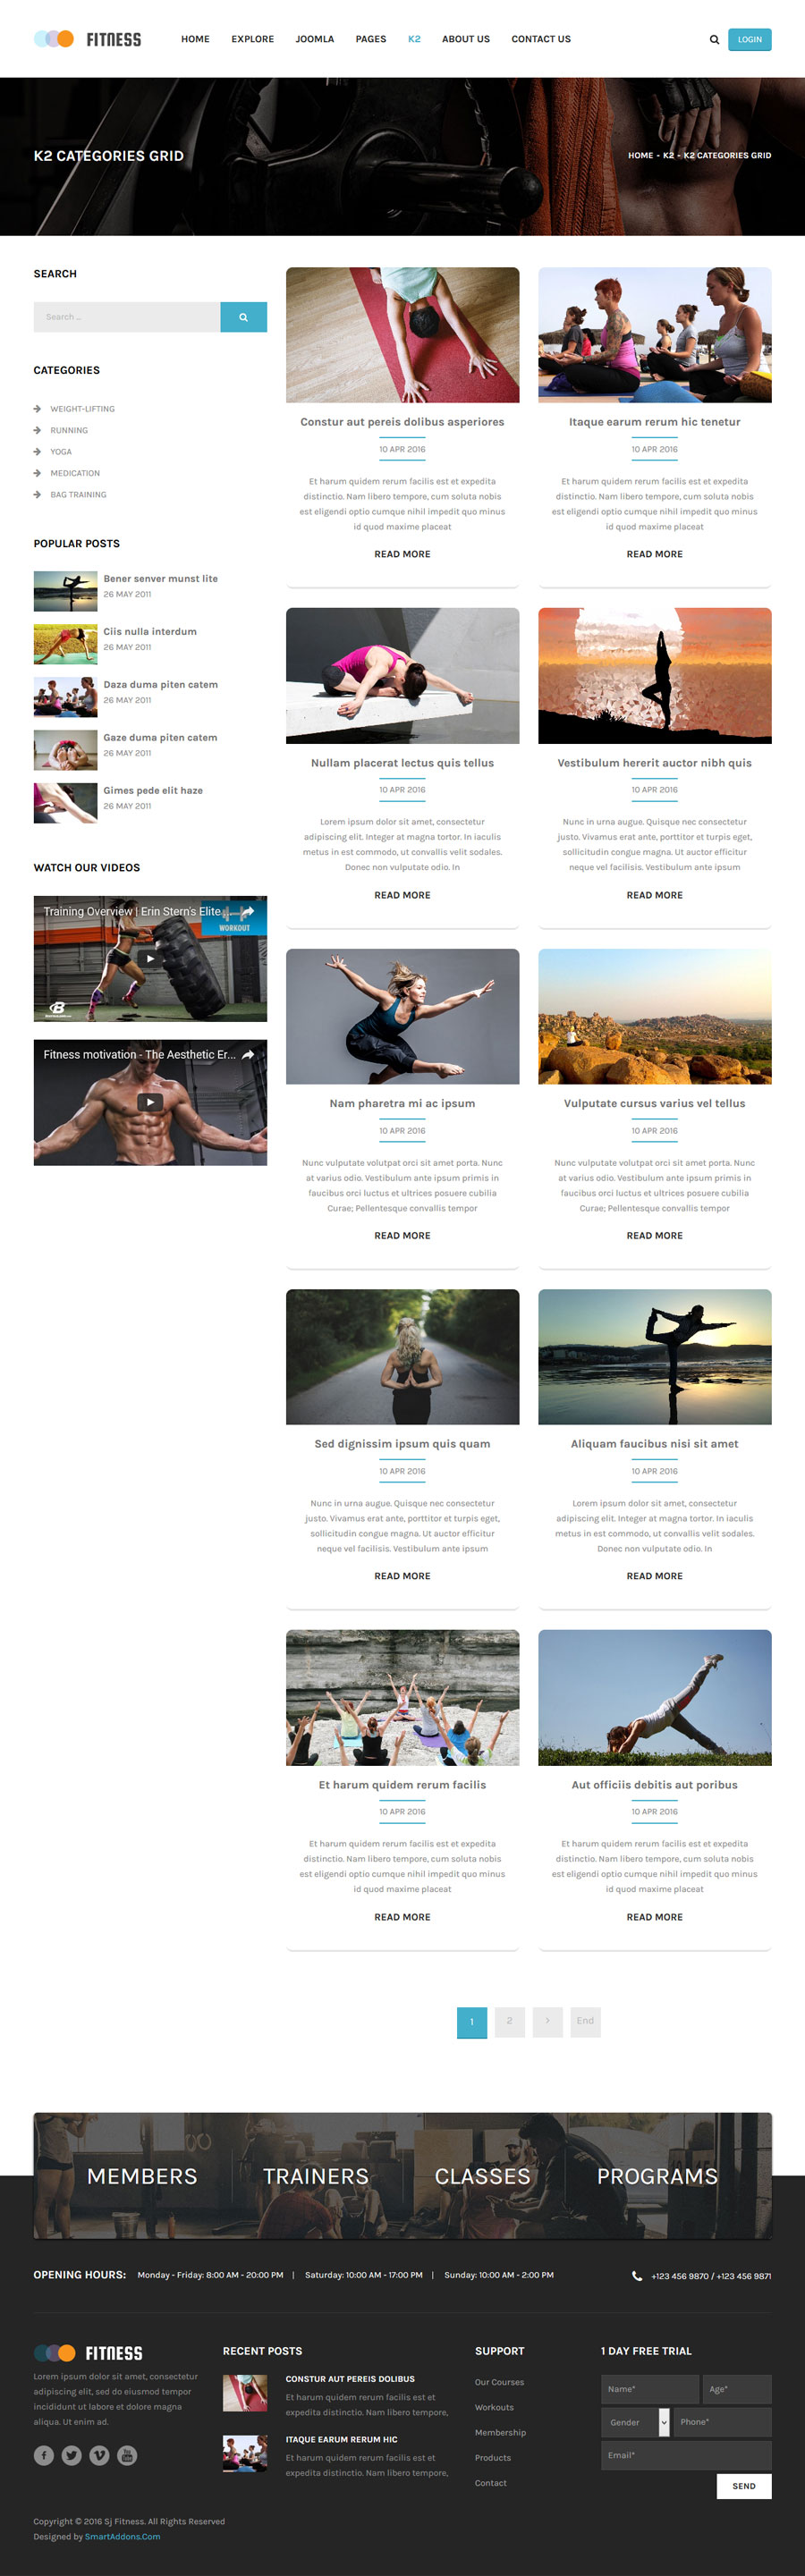 Fitness - Responsive Joomla Yoga Club Template by SmartAddons ...